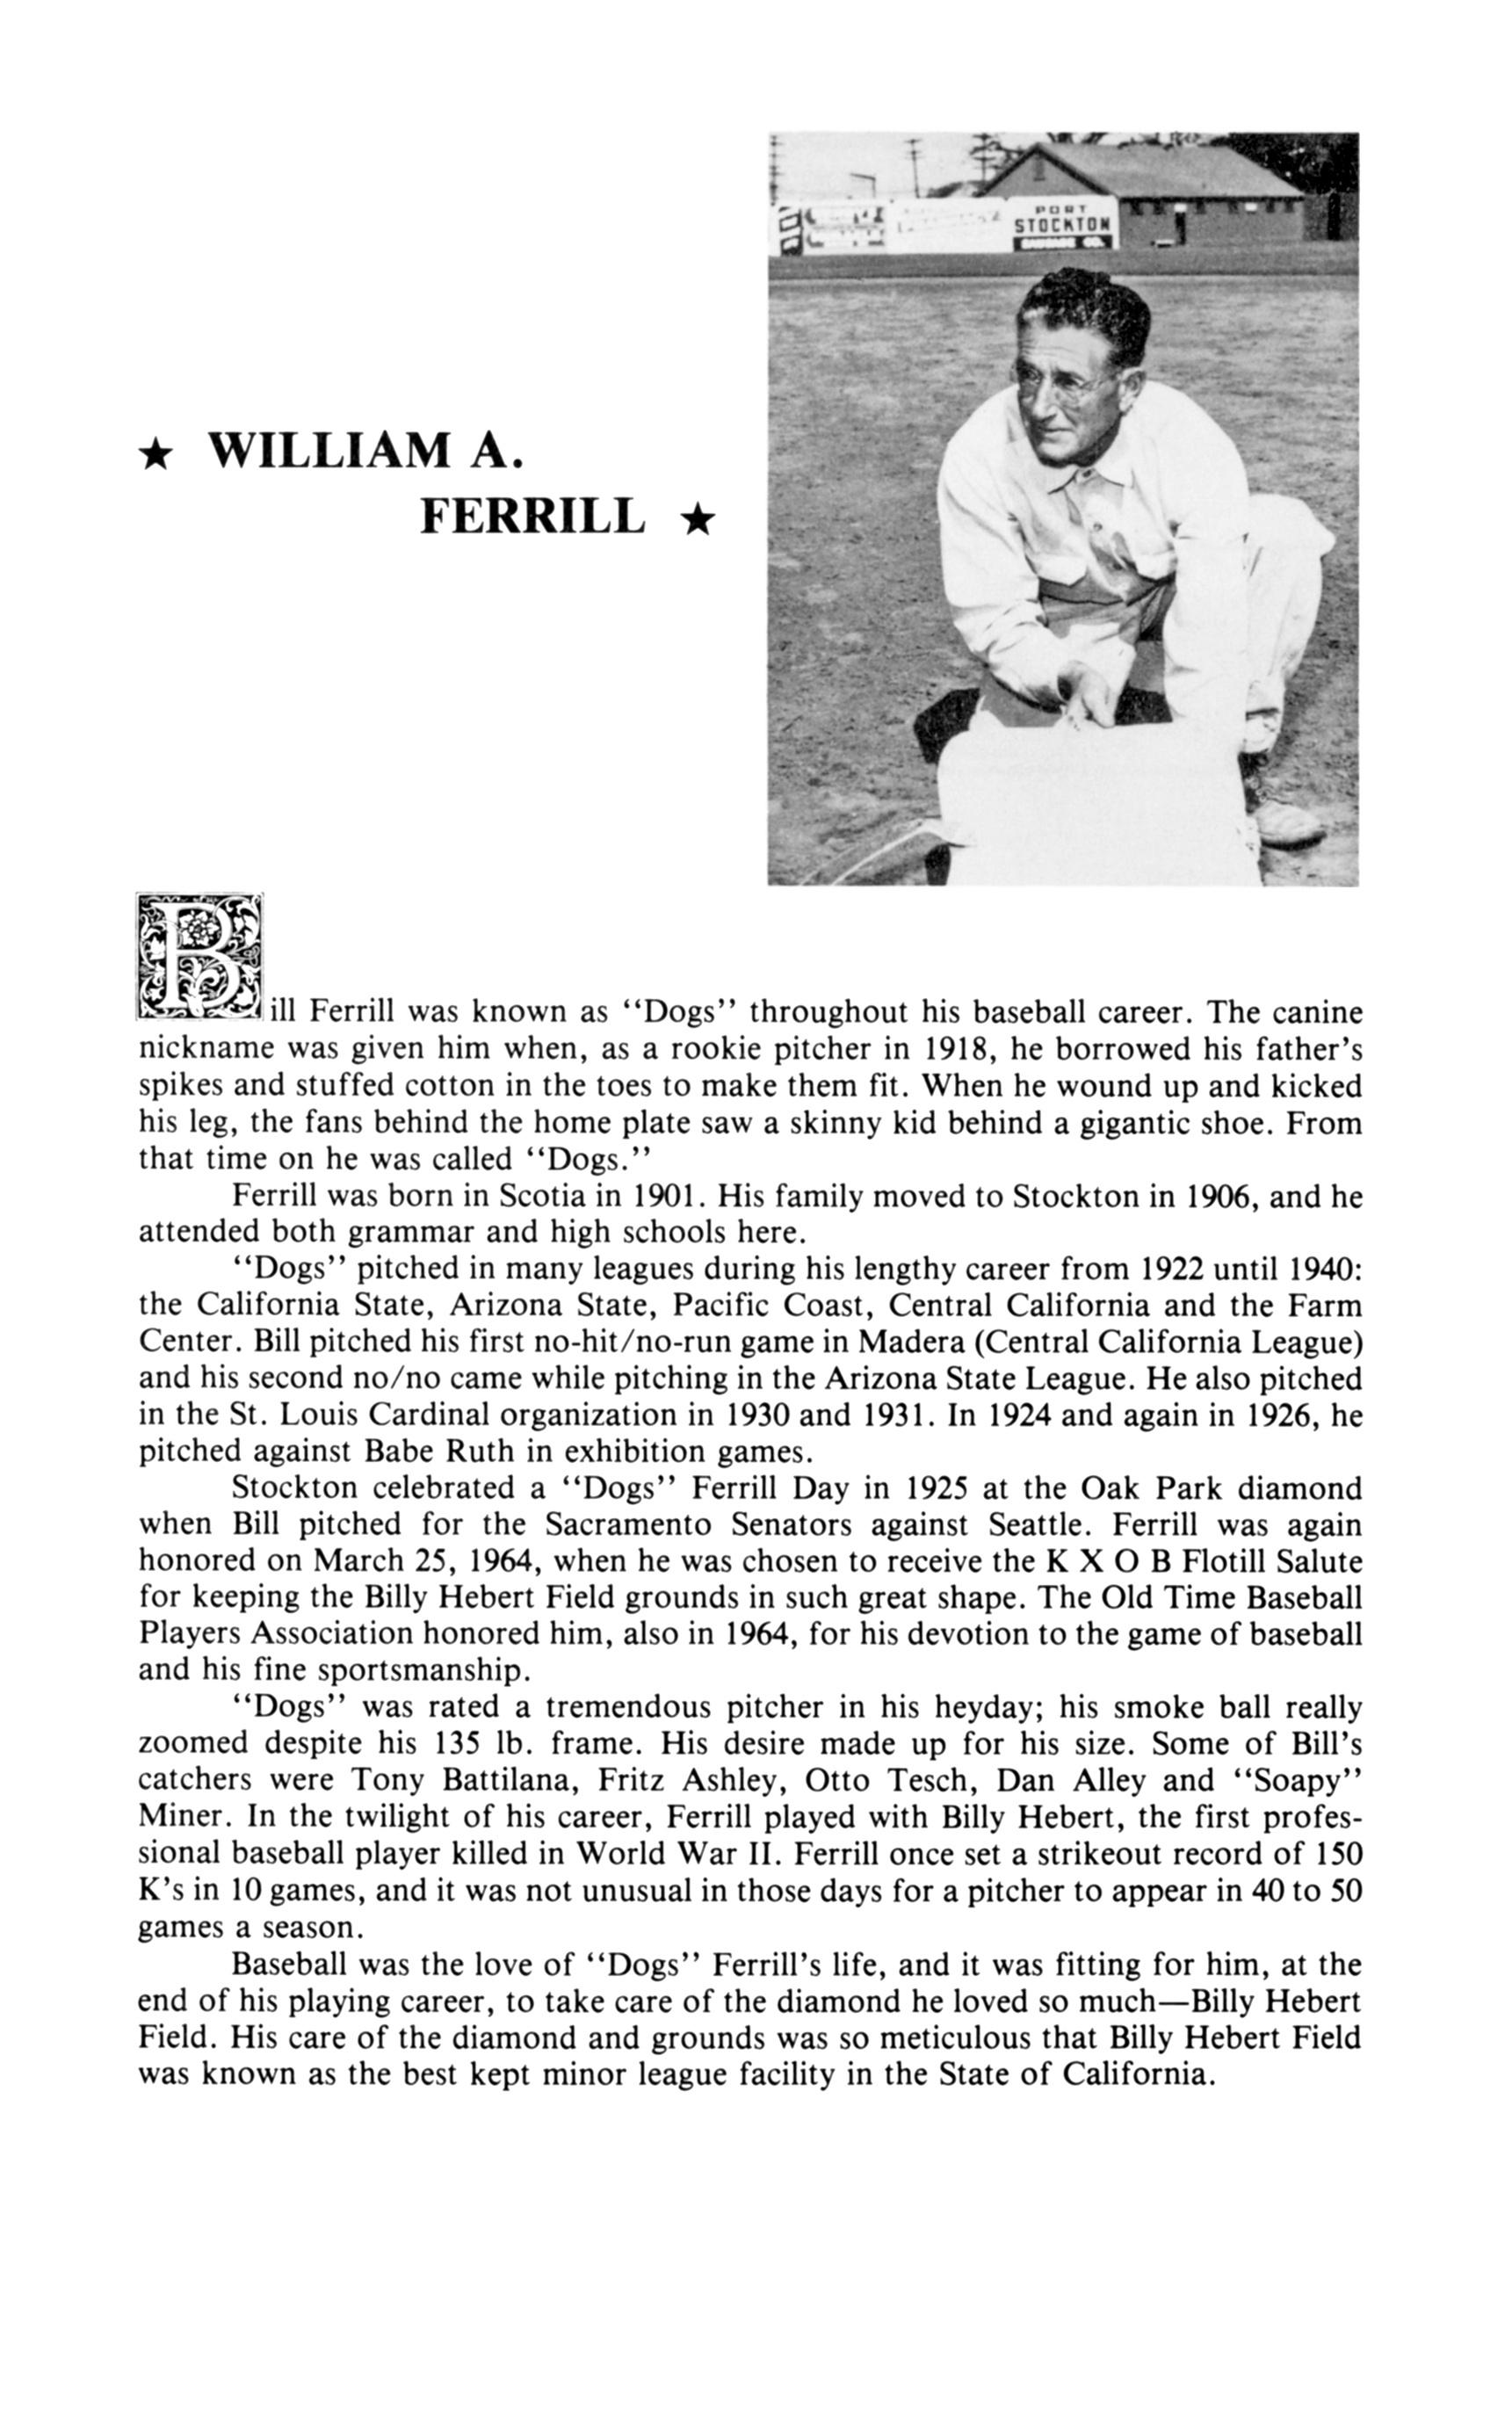 William-A-Ferrill-89_13